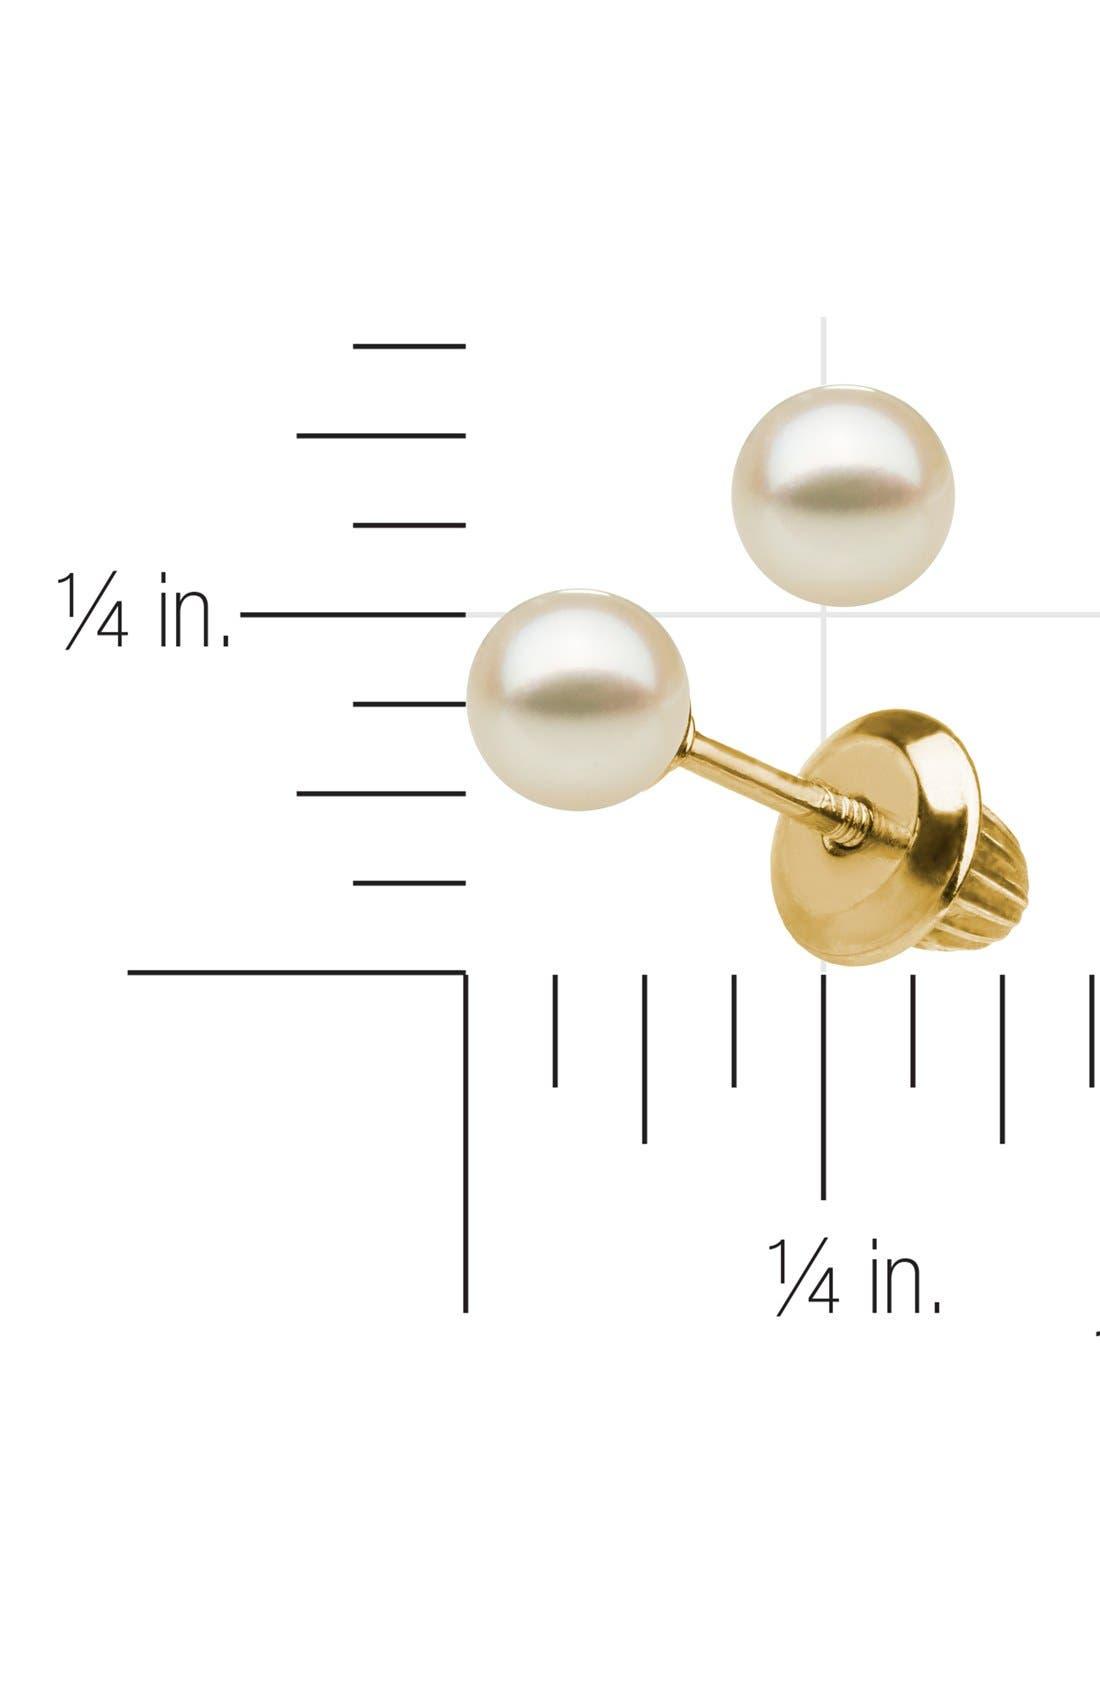 14k Gold & Pearl Earrings,                             Alternate thumbnail 2, color,                             GOLD